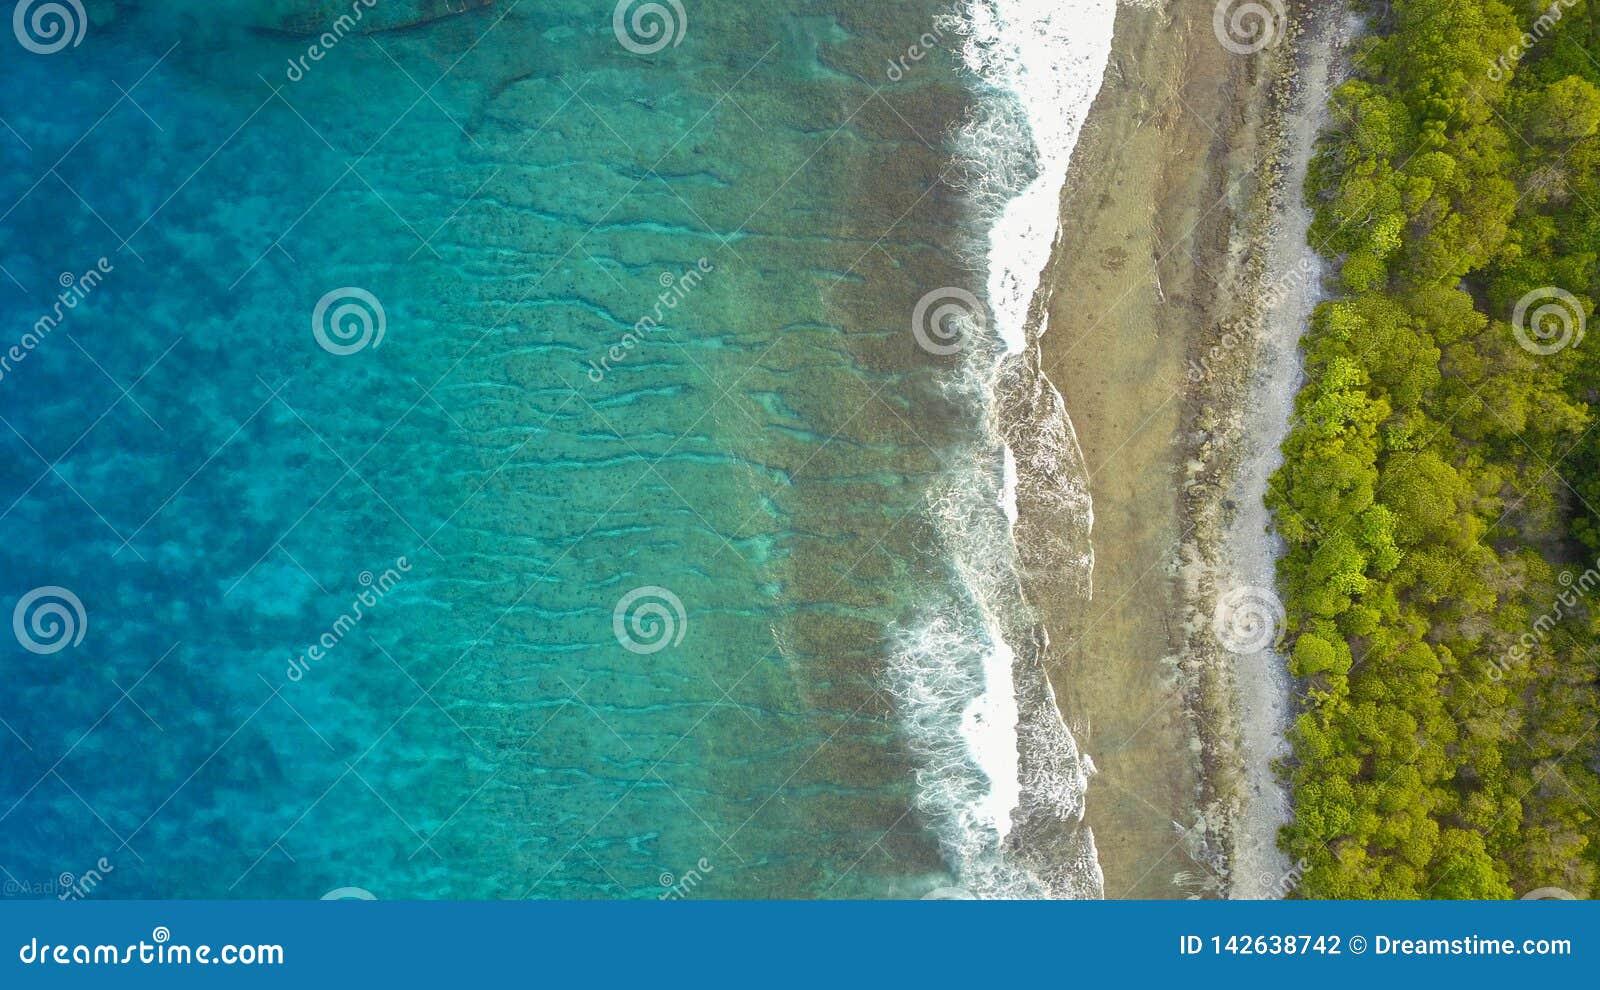 Kryształ - jasne błękitne ocean fale